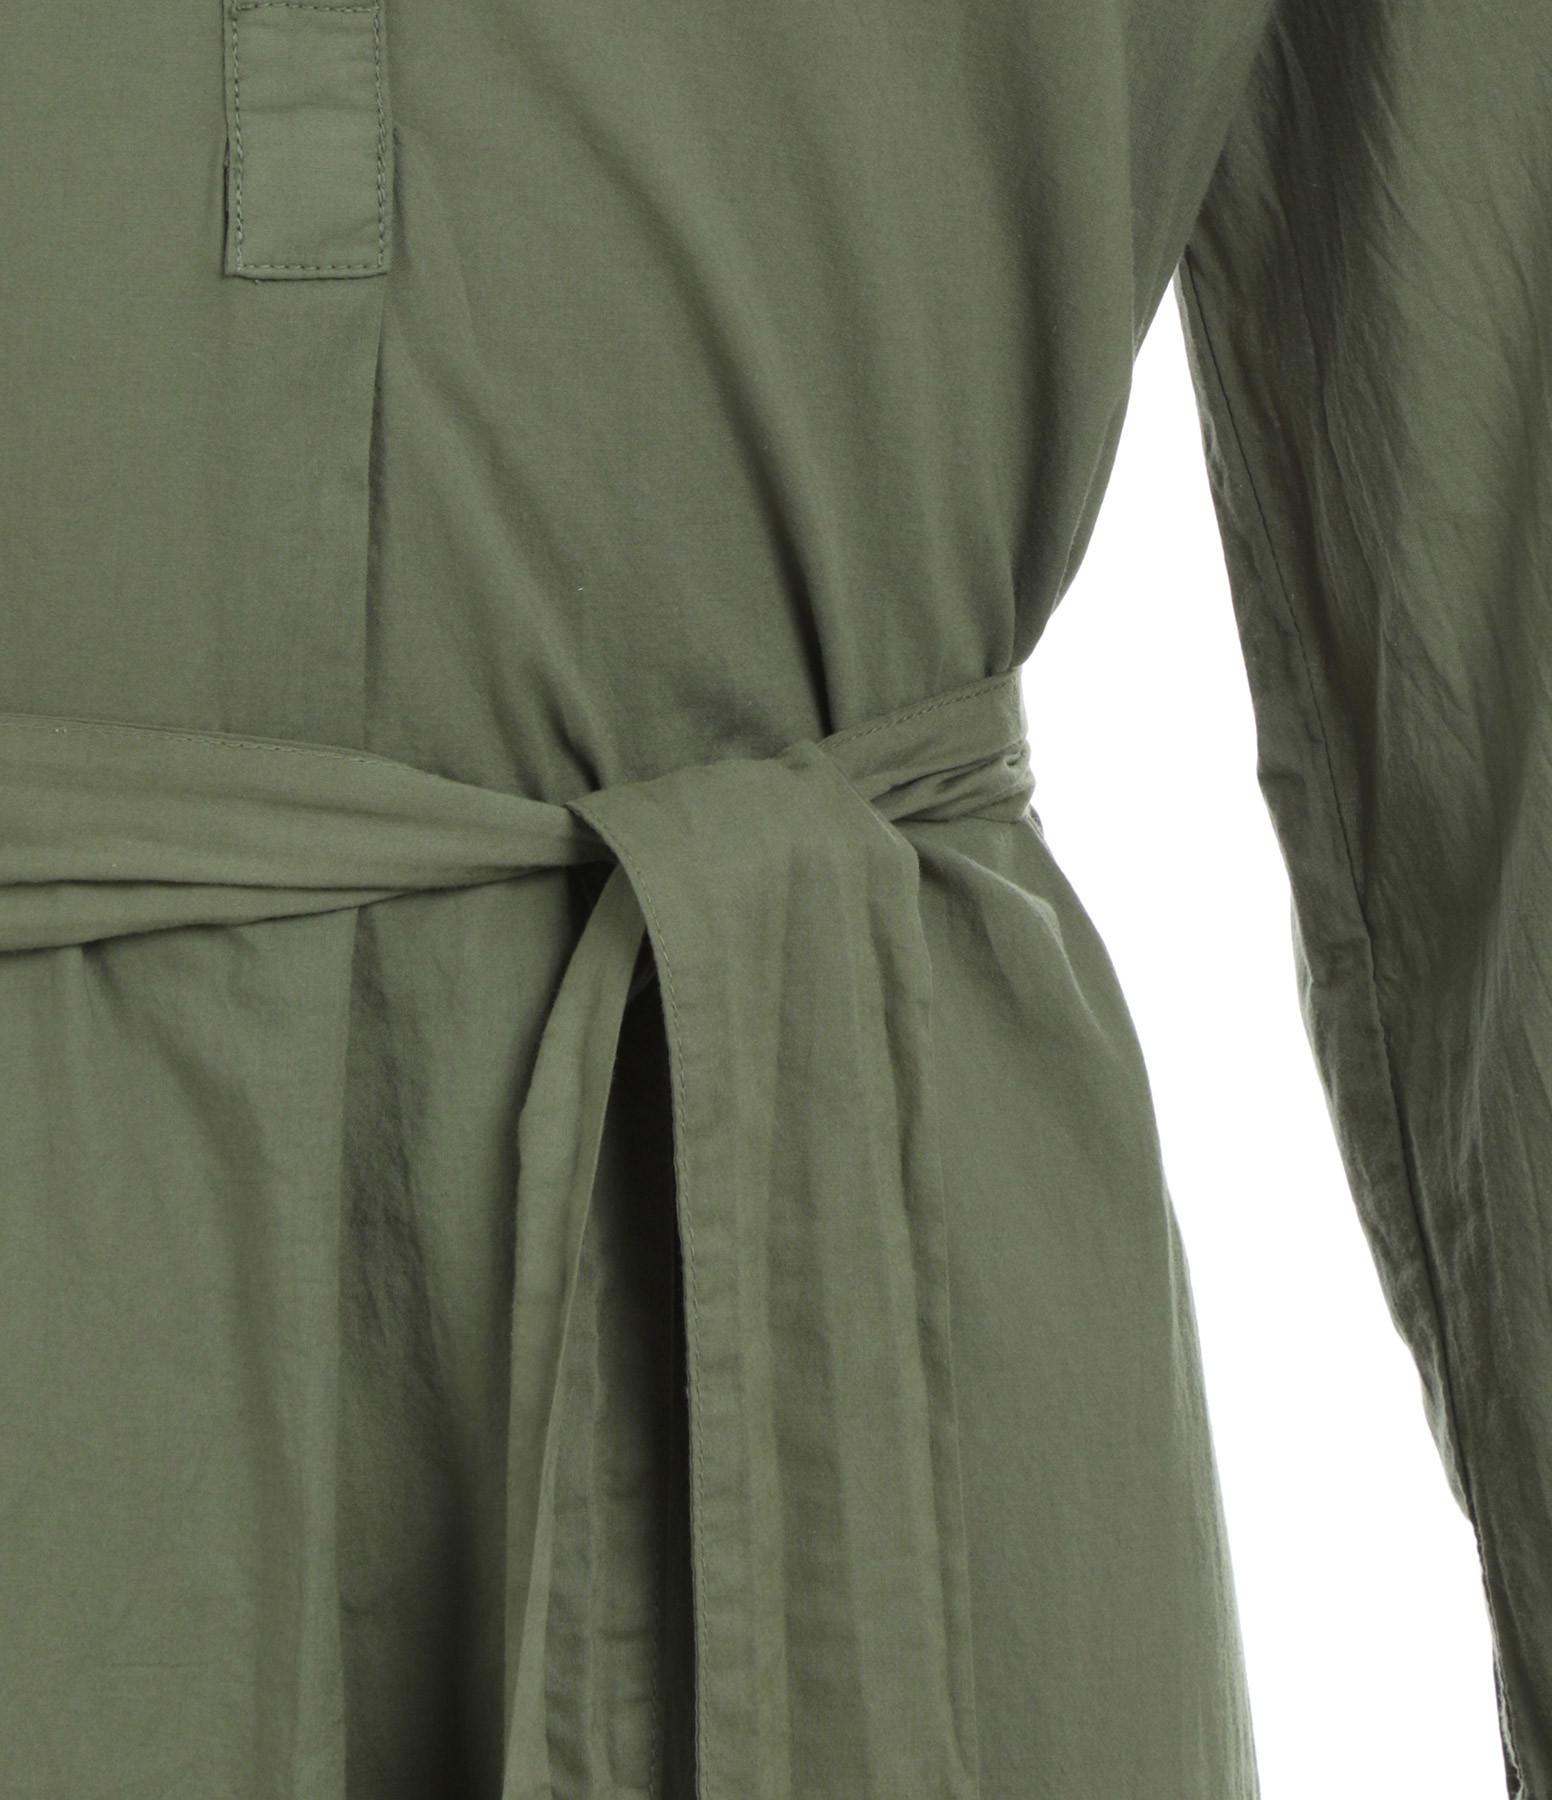 XIRENA - Robe Hope Vert Olive